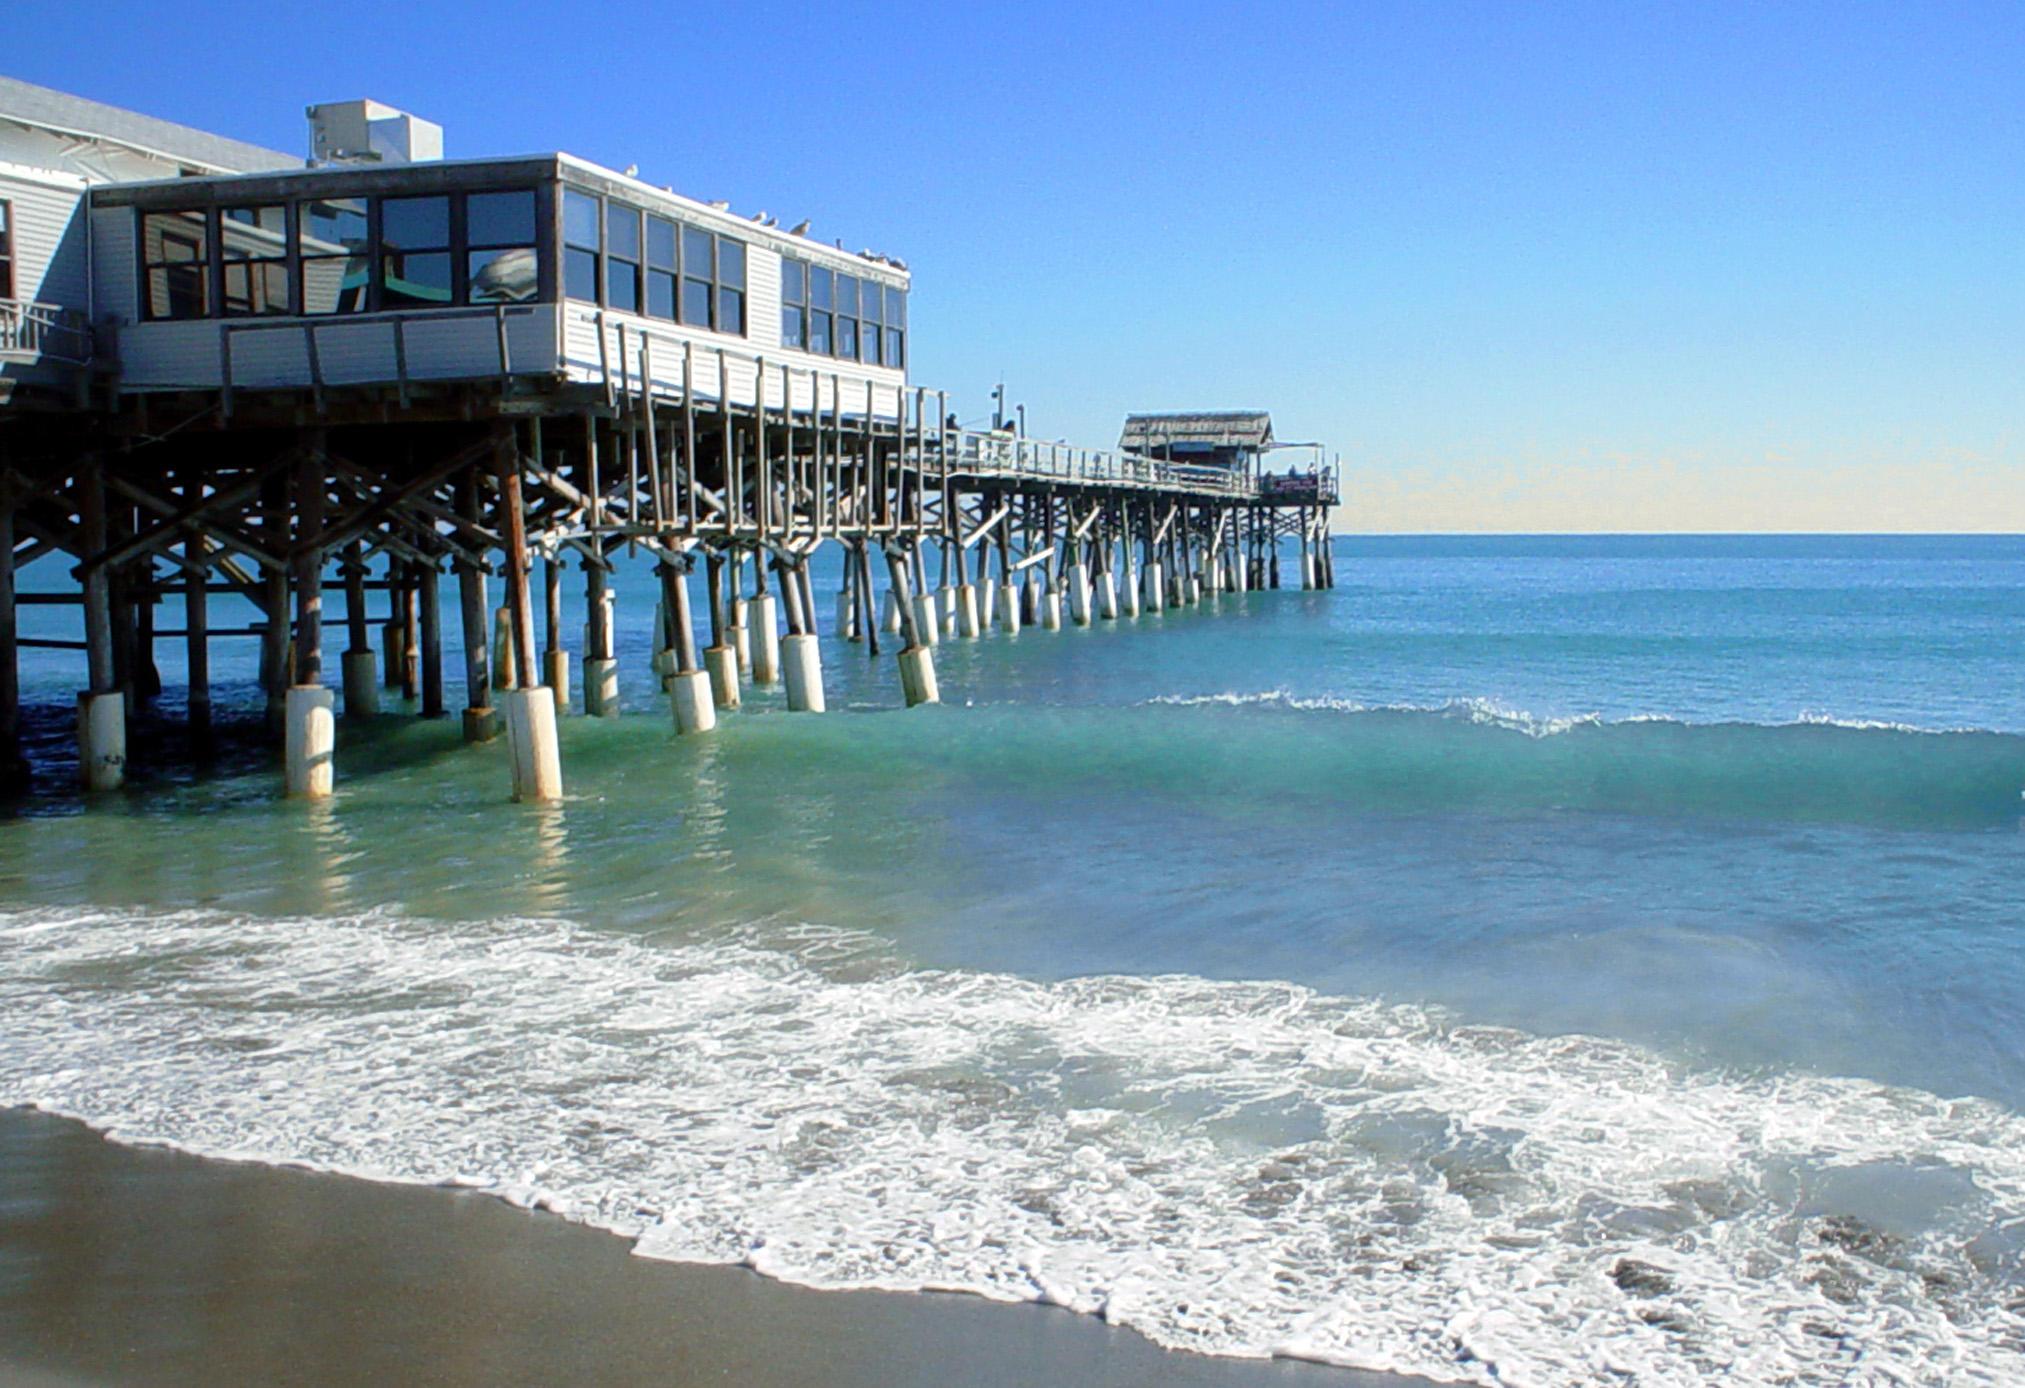 Cocoa Beach Pier Cocoa Beach Pier by